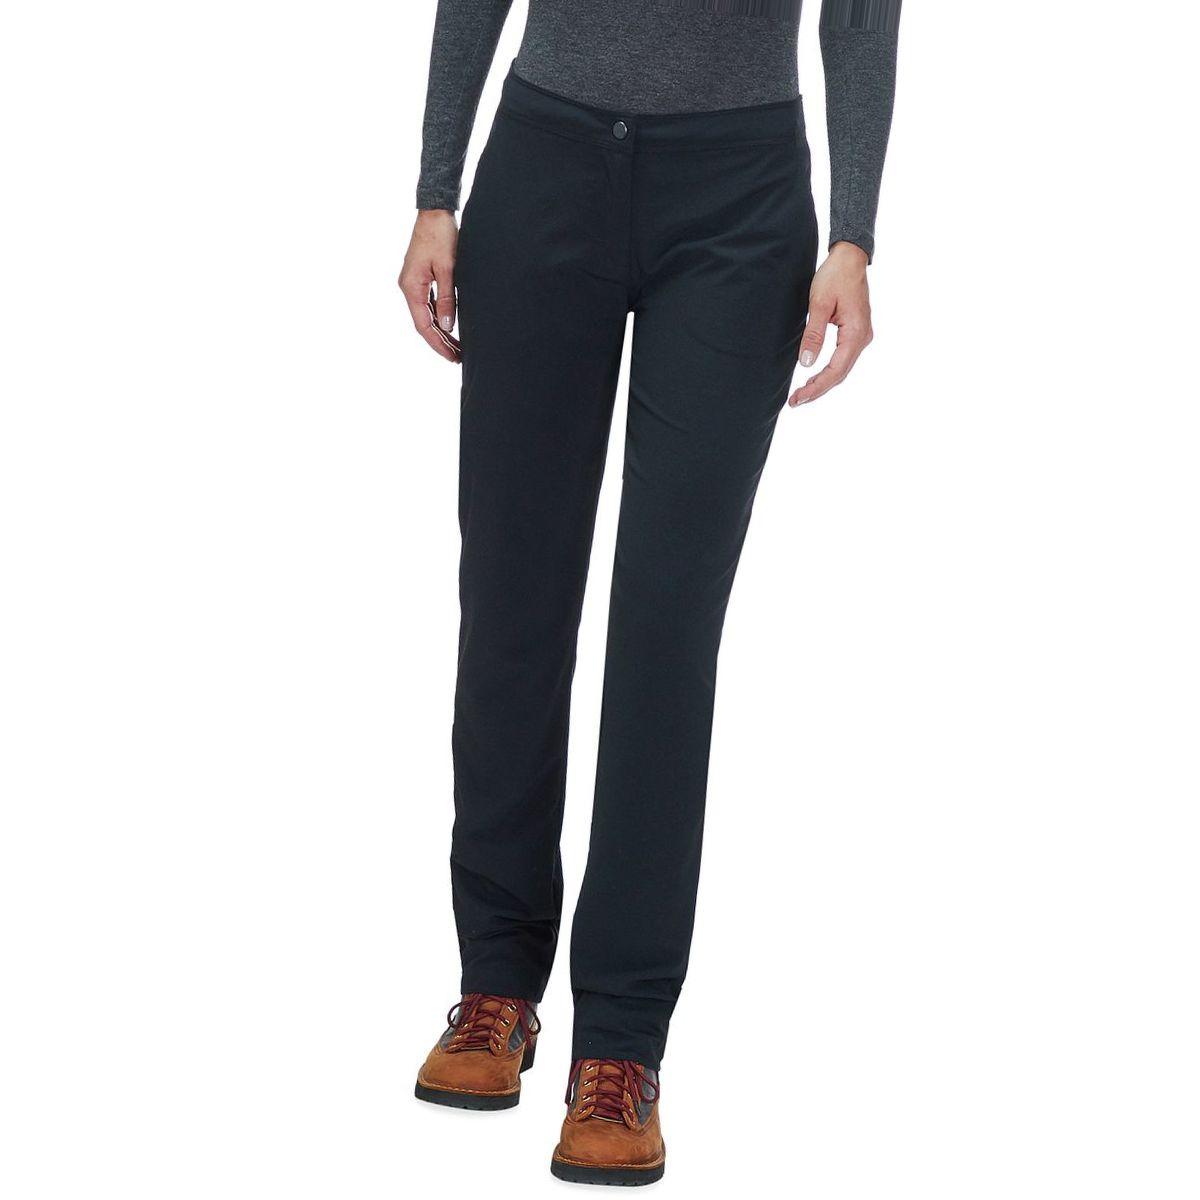 Mountain Hardwear Right Bank Lined Pant - Women's